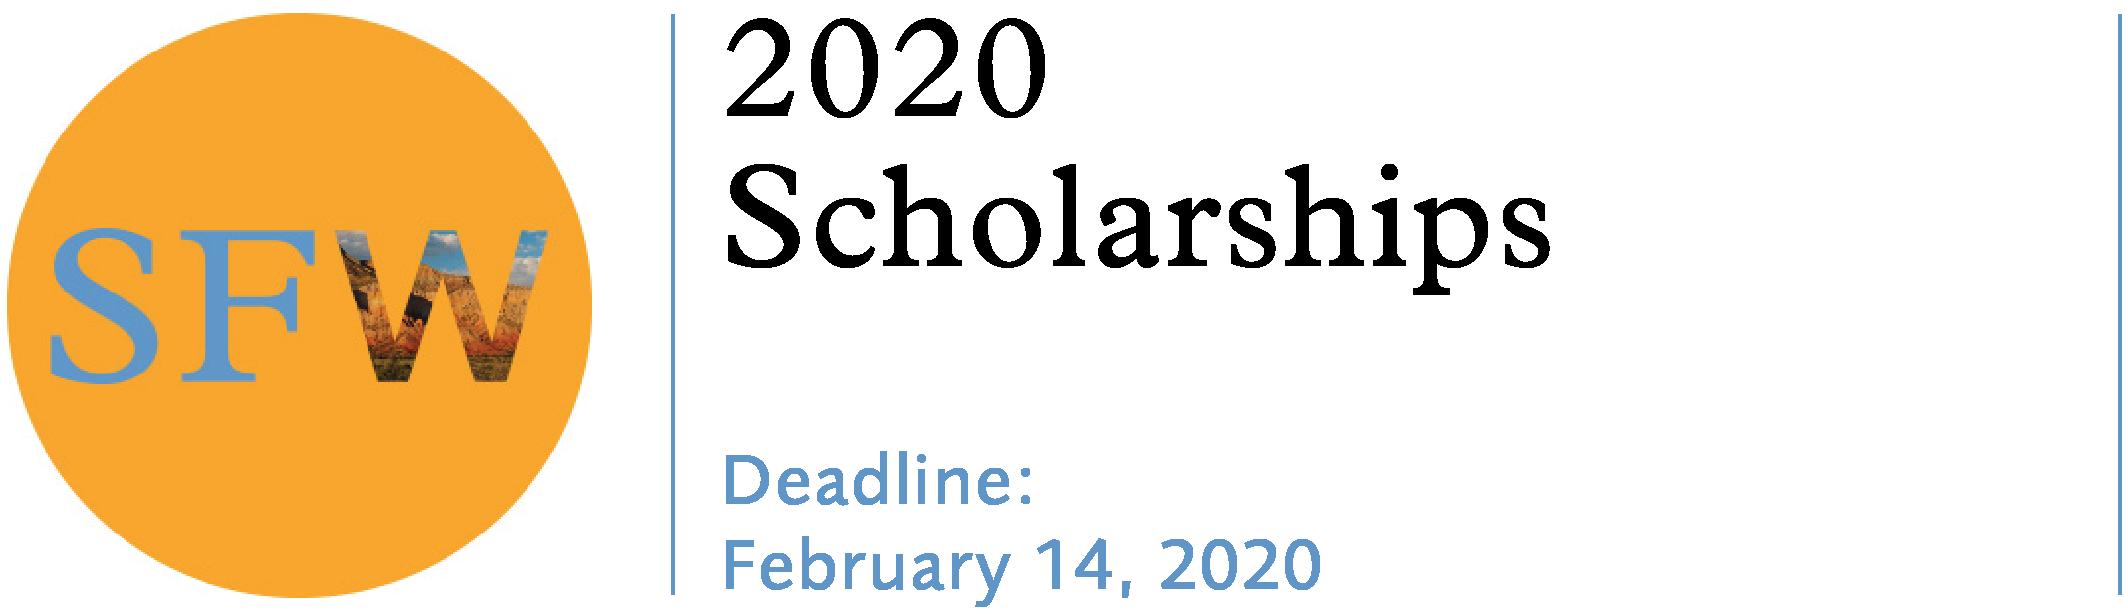 Santa Fe Workshops 2020 Scholarships